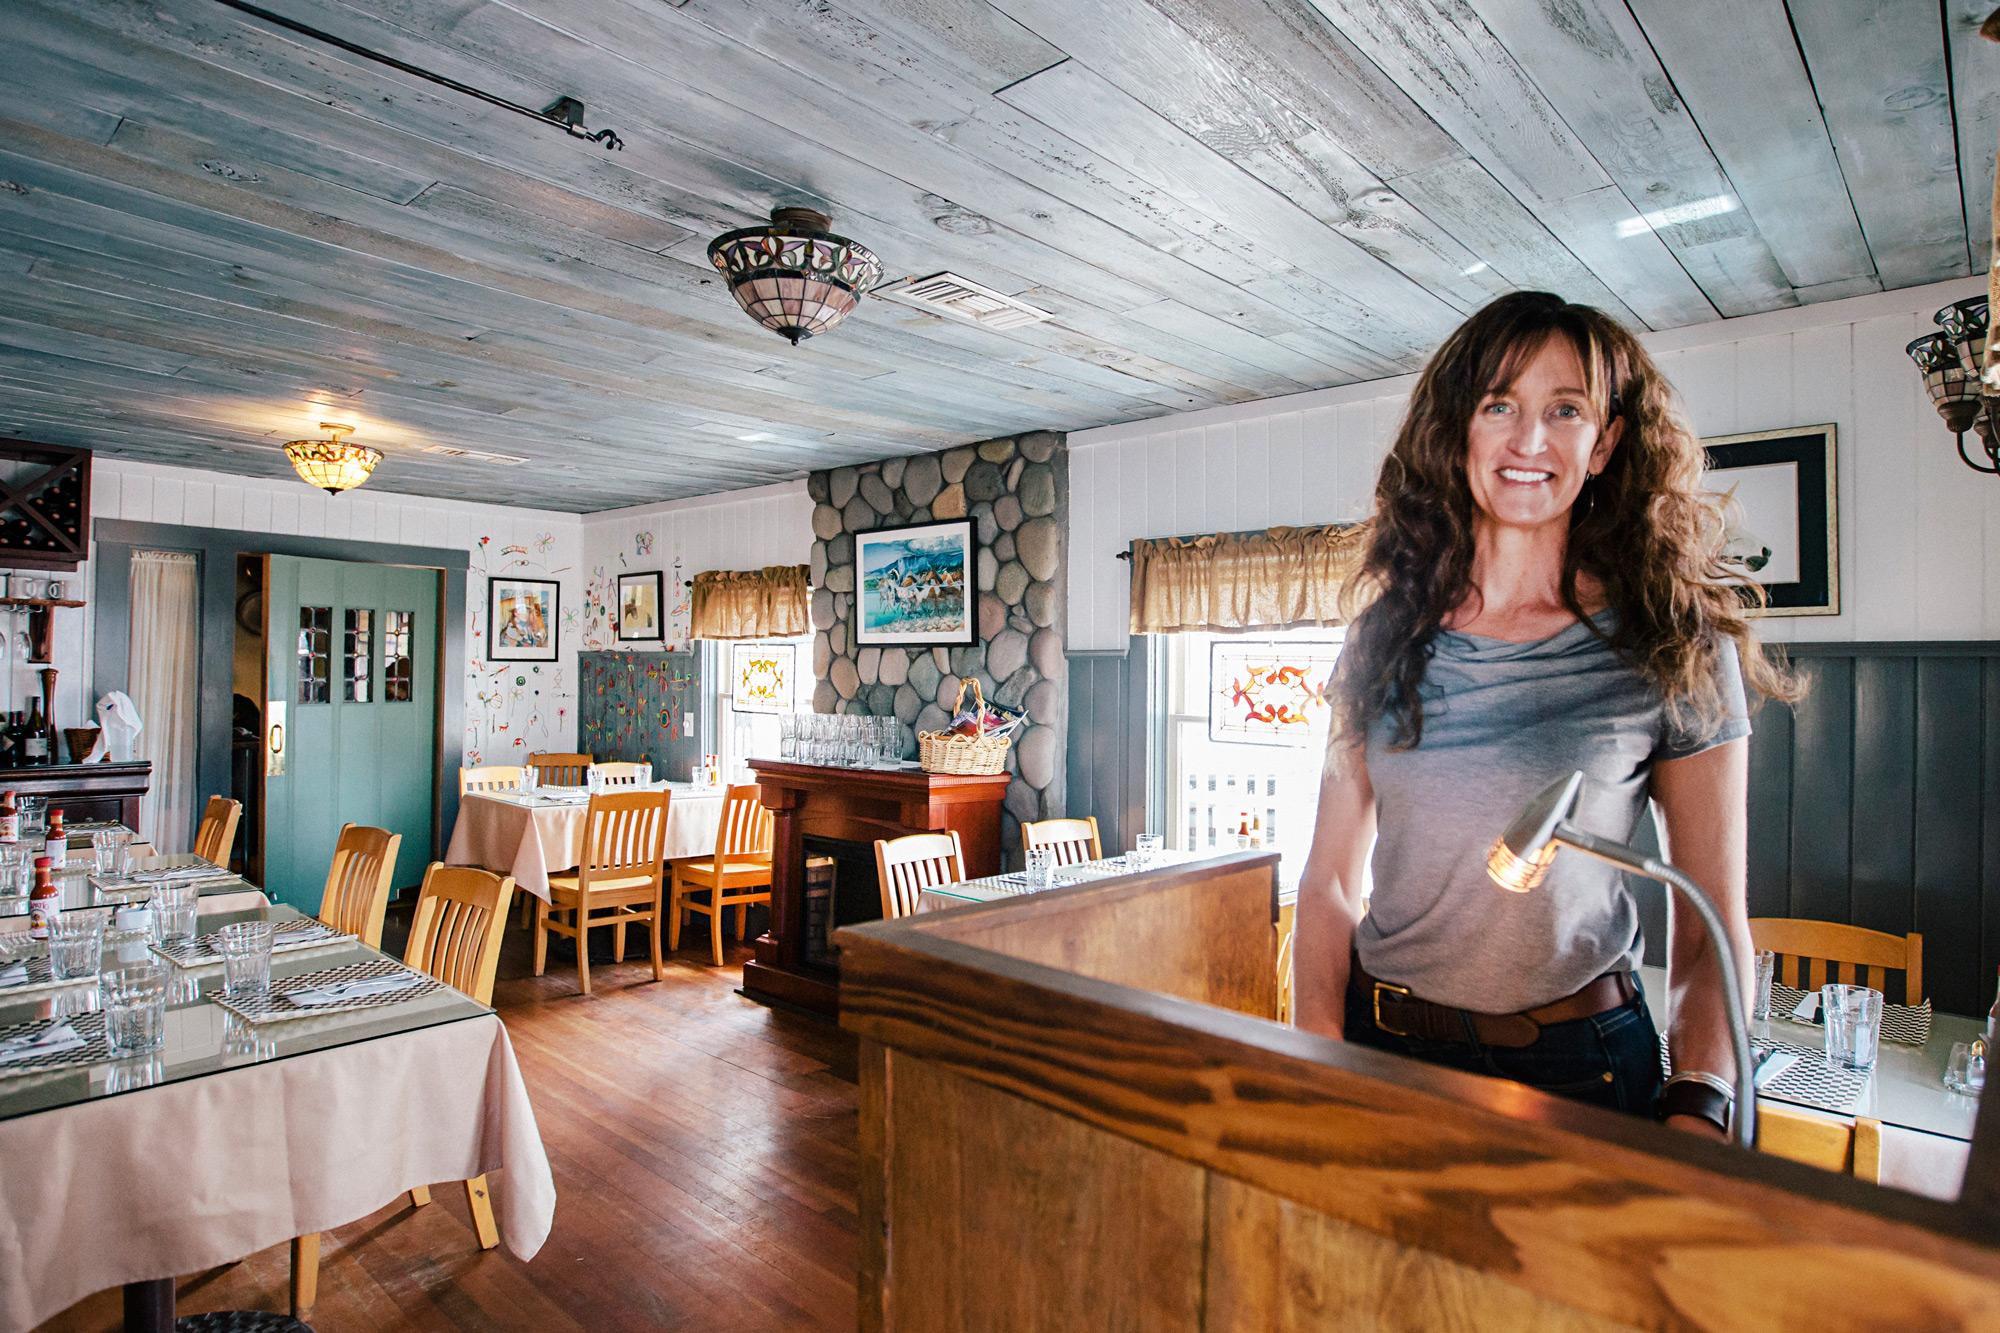 cottonwood-cafe-best-service-in-sisters-oregon-breakfast-lunch-restaurant.jpg